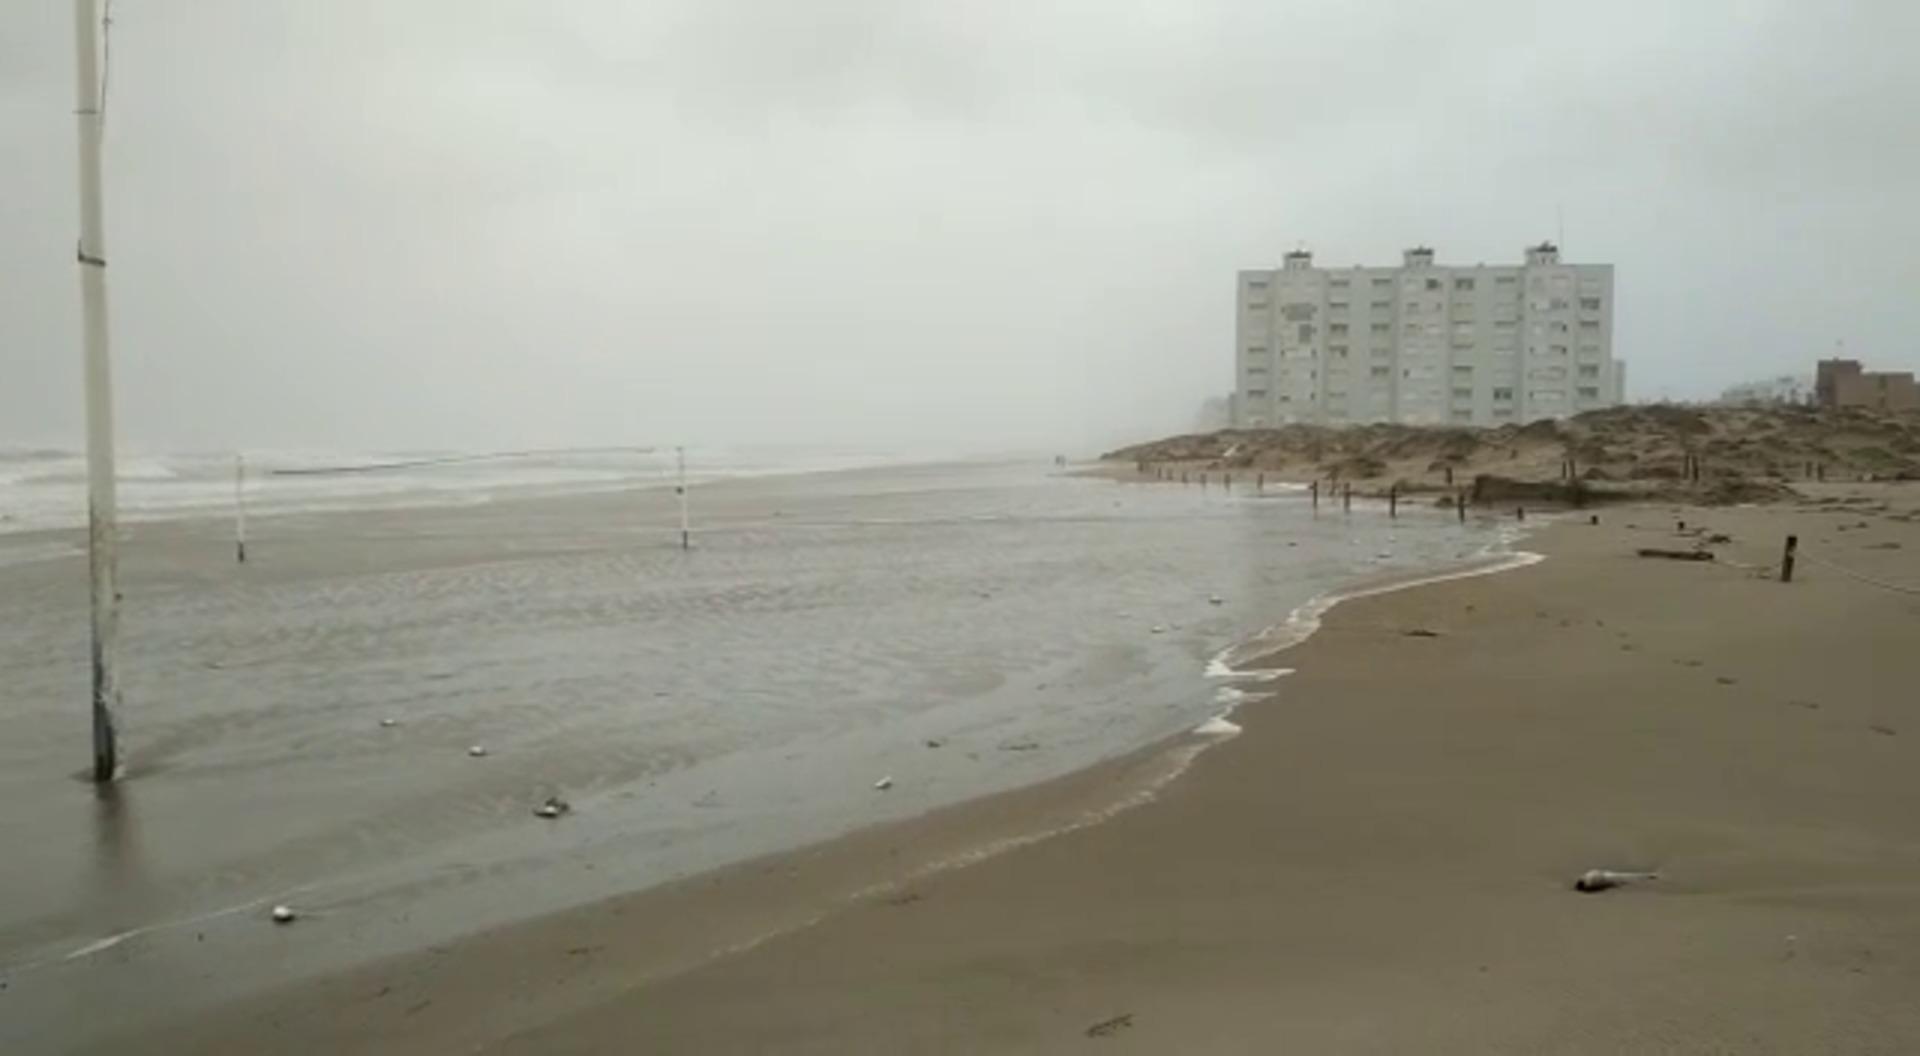 La playa del Perellonet después del fuerte temporal